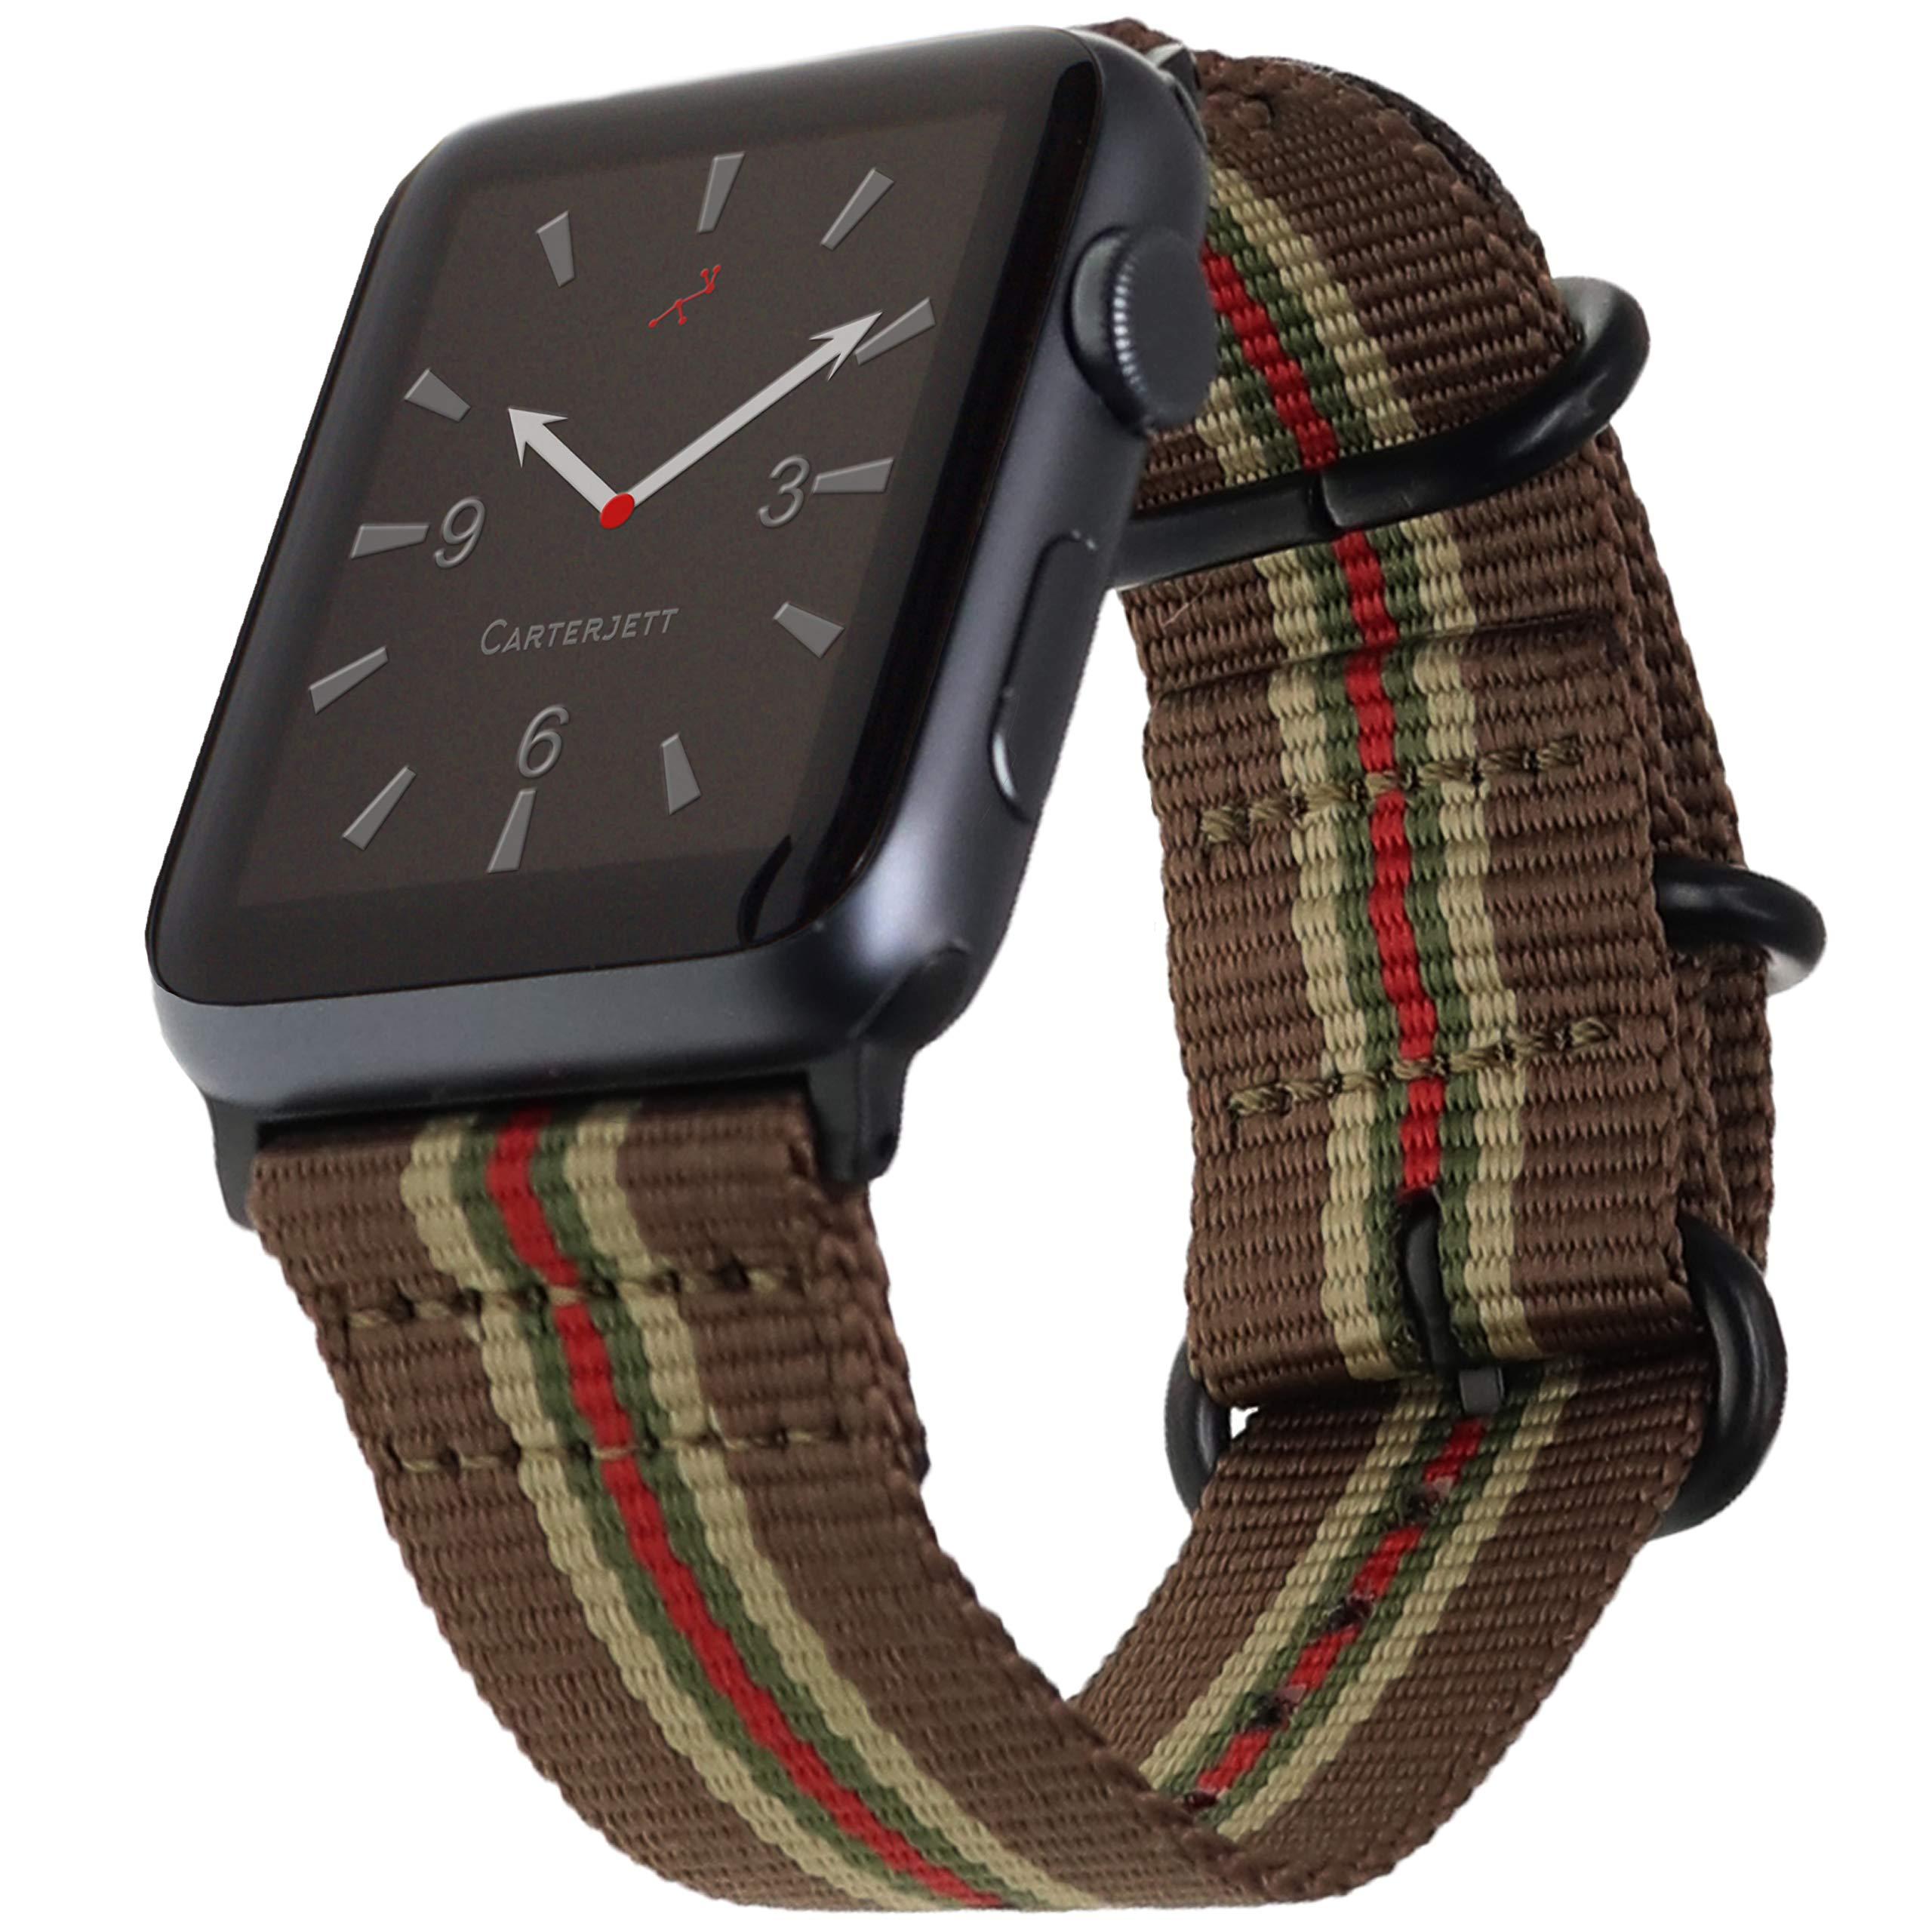 Malla Nylon para Apple Watch (42/44mm) CARTERJETT [7WF9LG56]